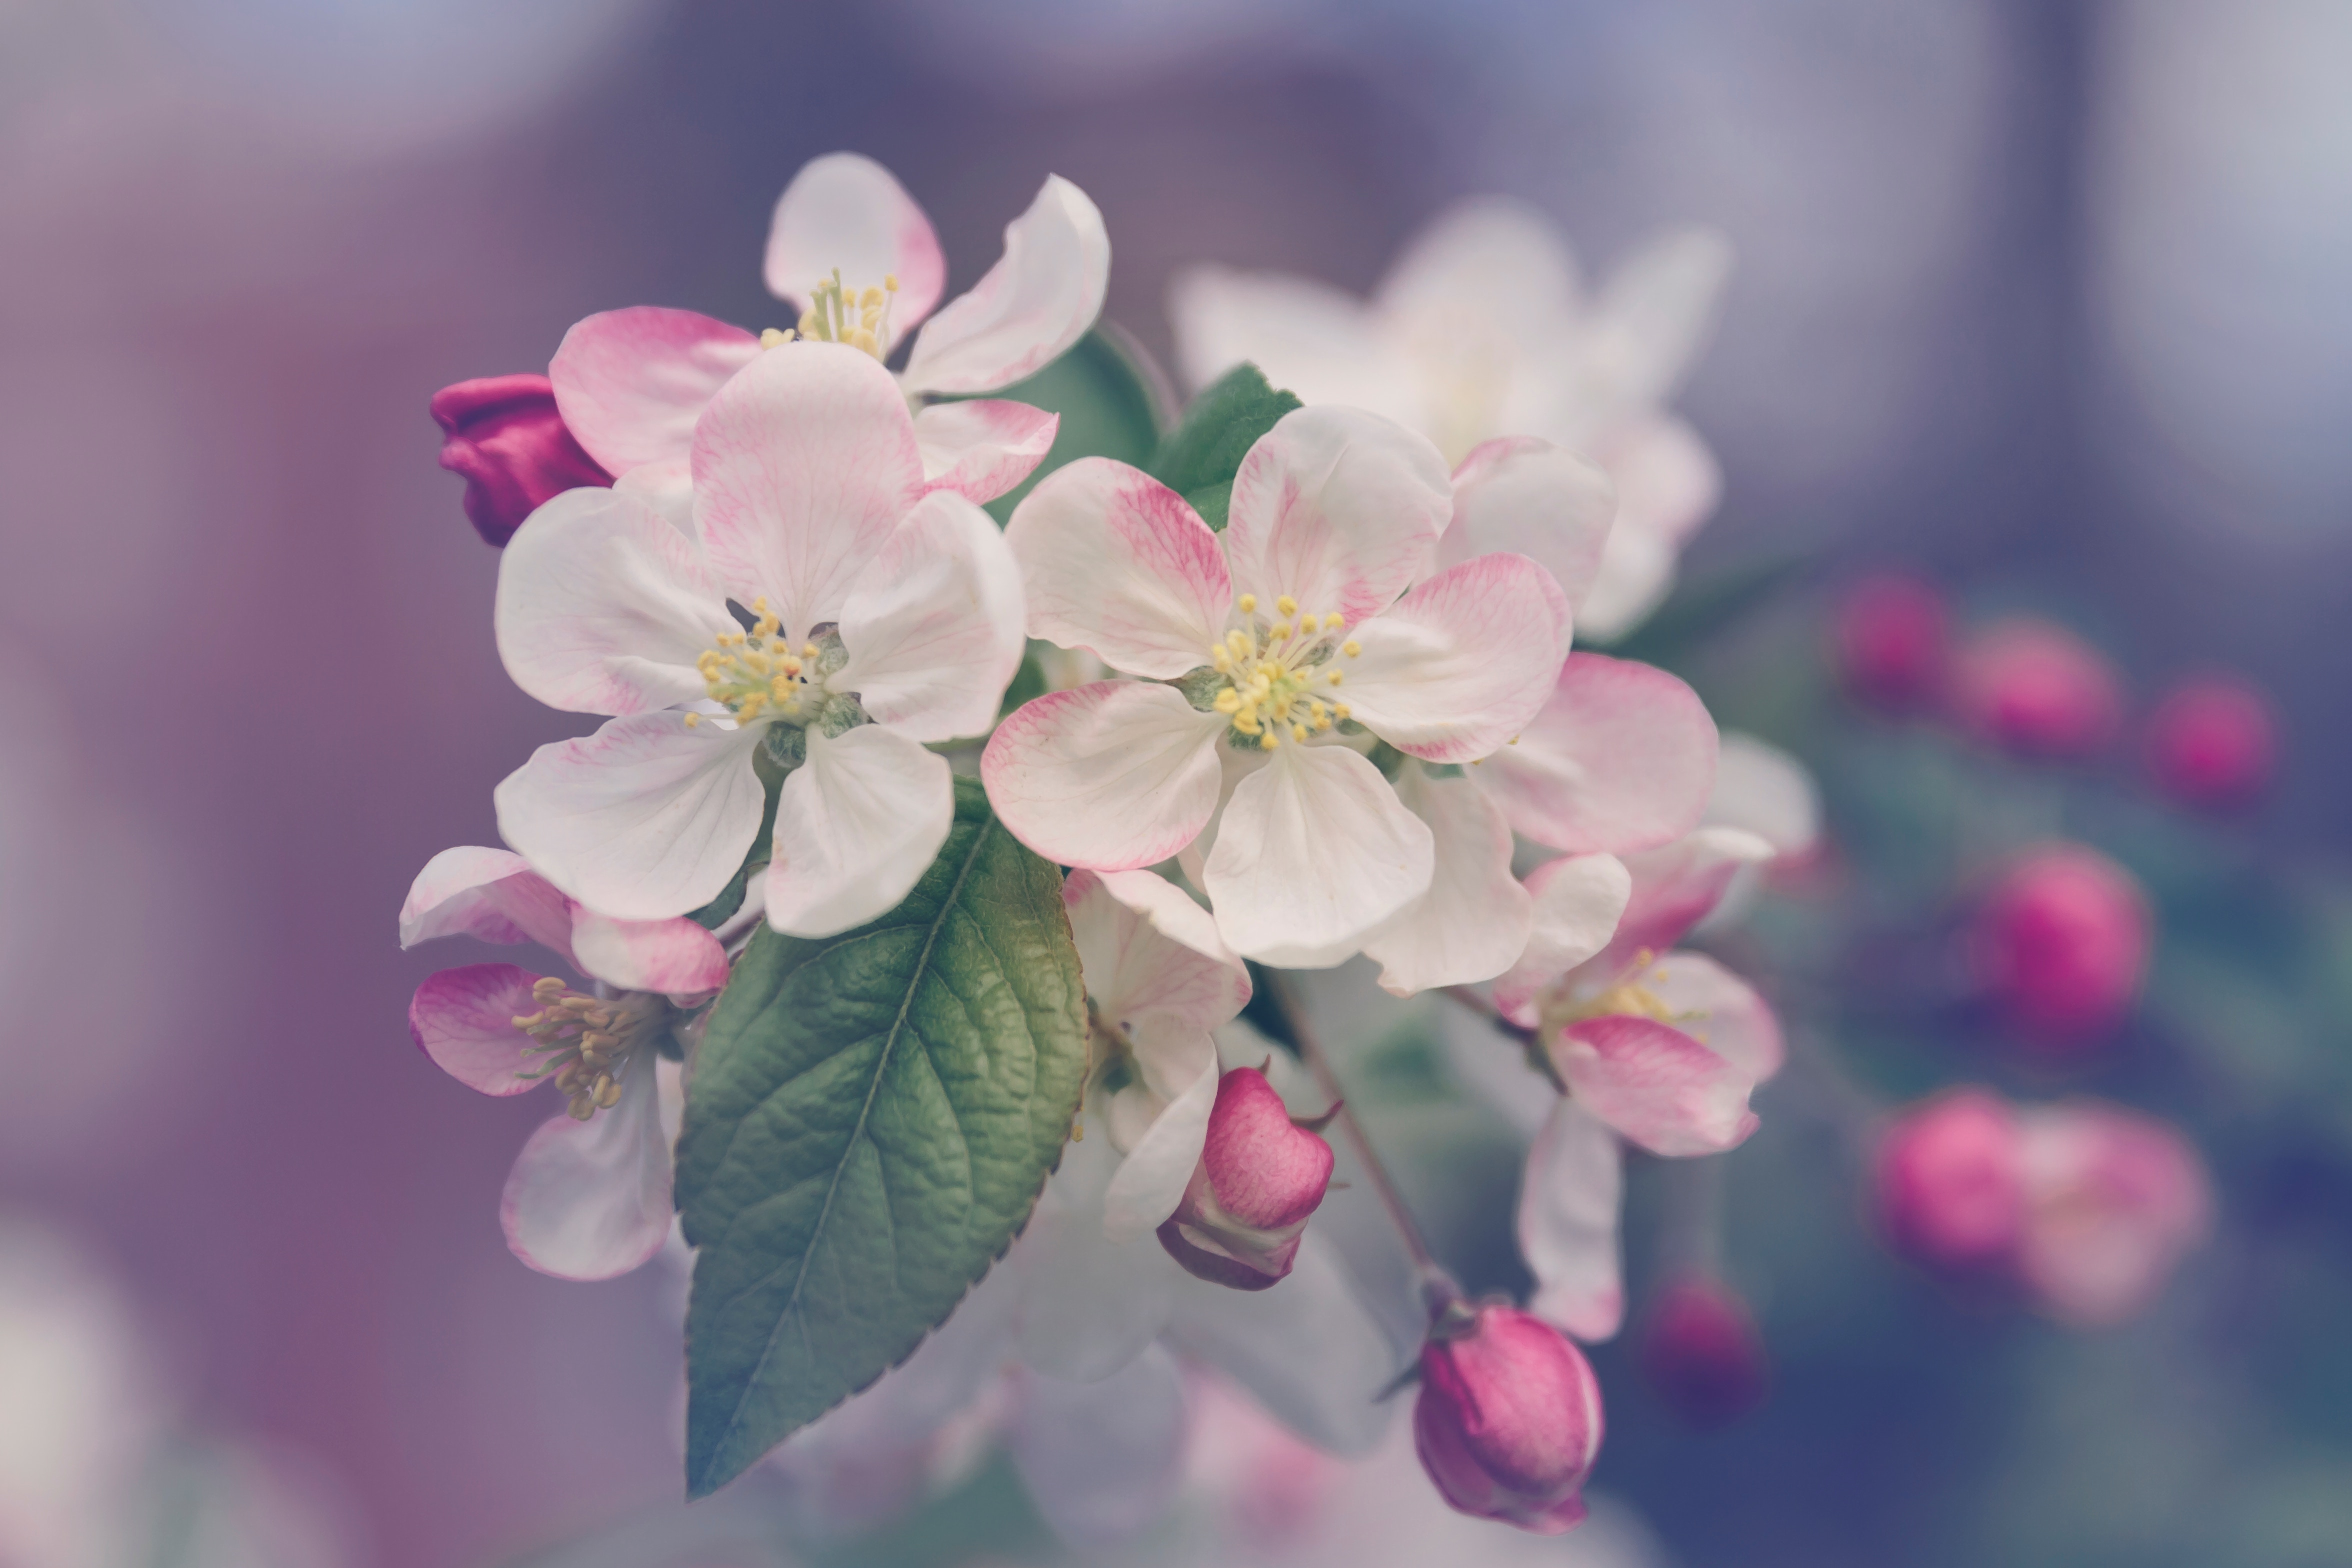 The Beauty of Flowers, photo by Marivi Pazos via Unsplash